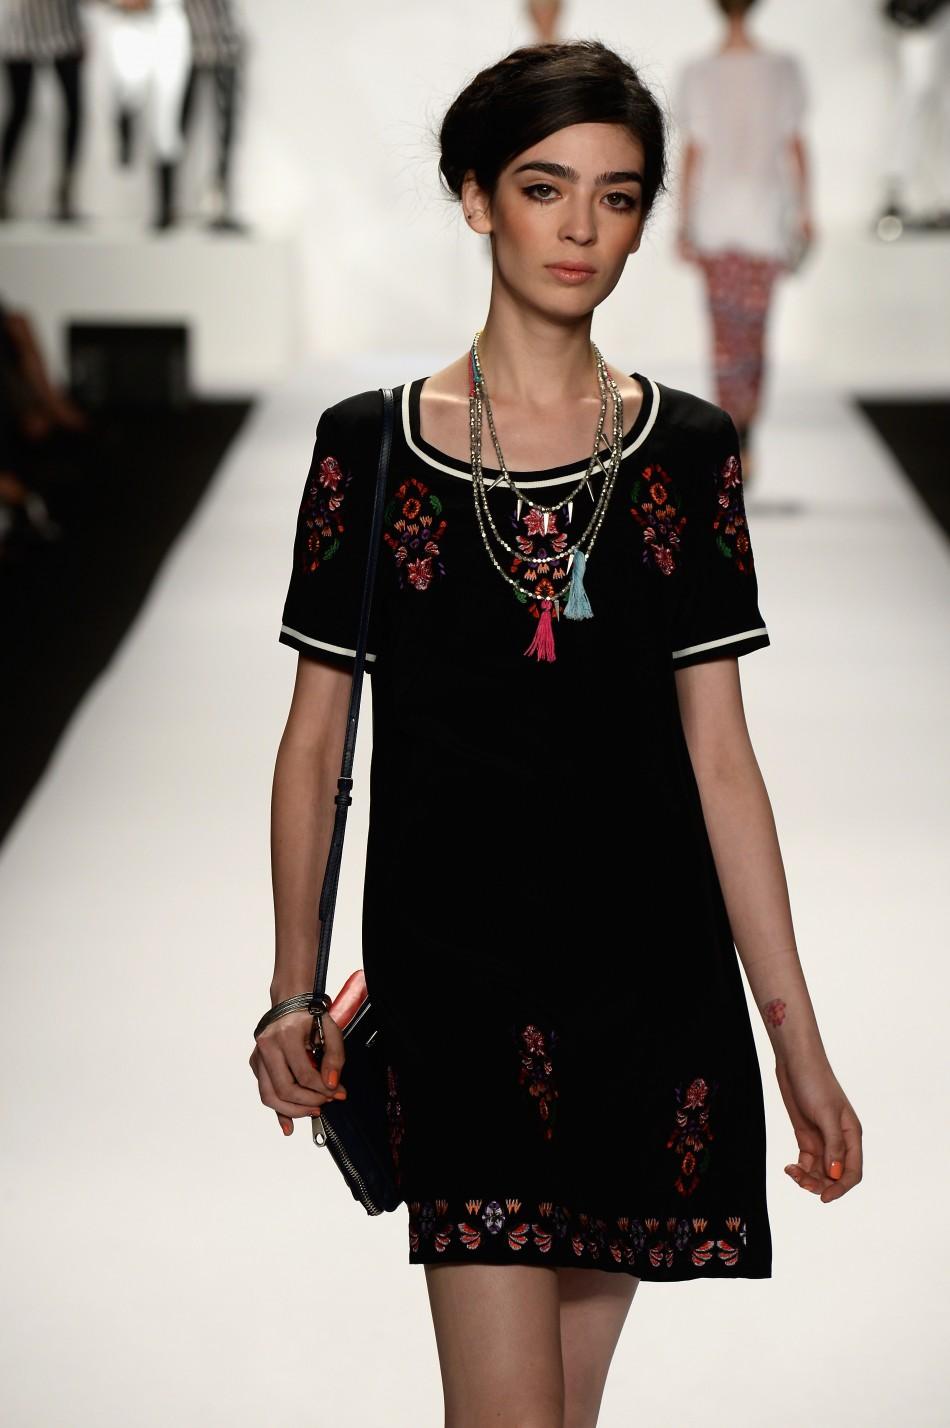 20591-rebecca-minkoff-spring-2014-new-york-fashion-week.jpg